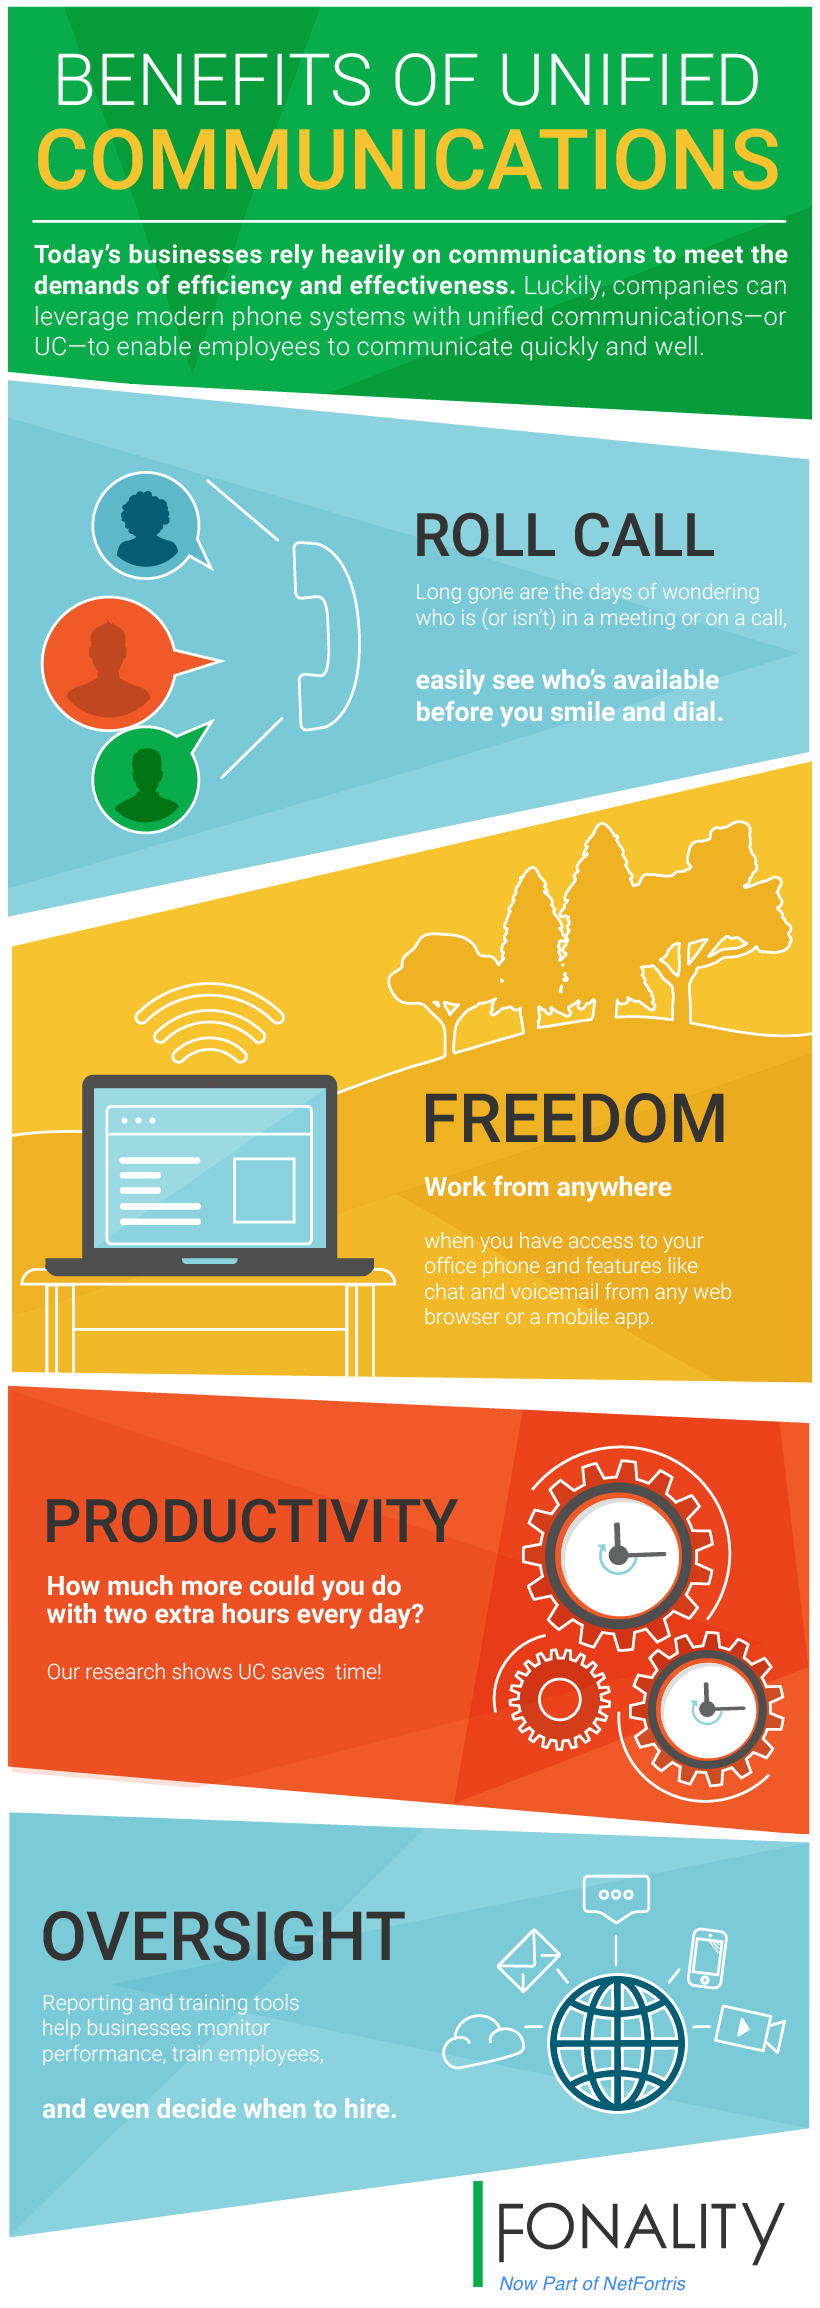 Fonality-Australia-Unified-Communication-Benefits-Infographic